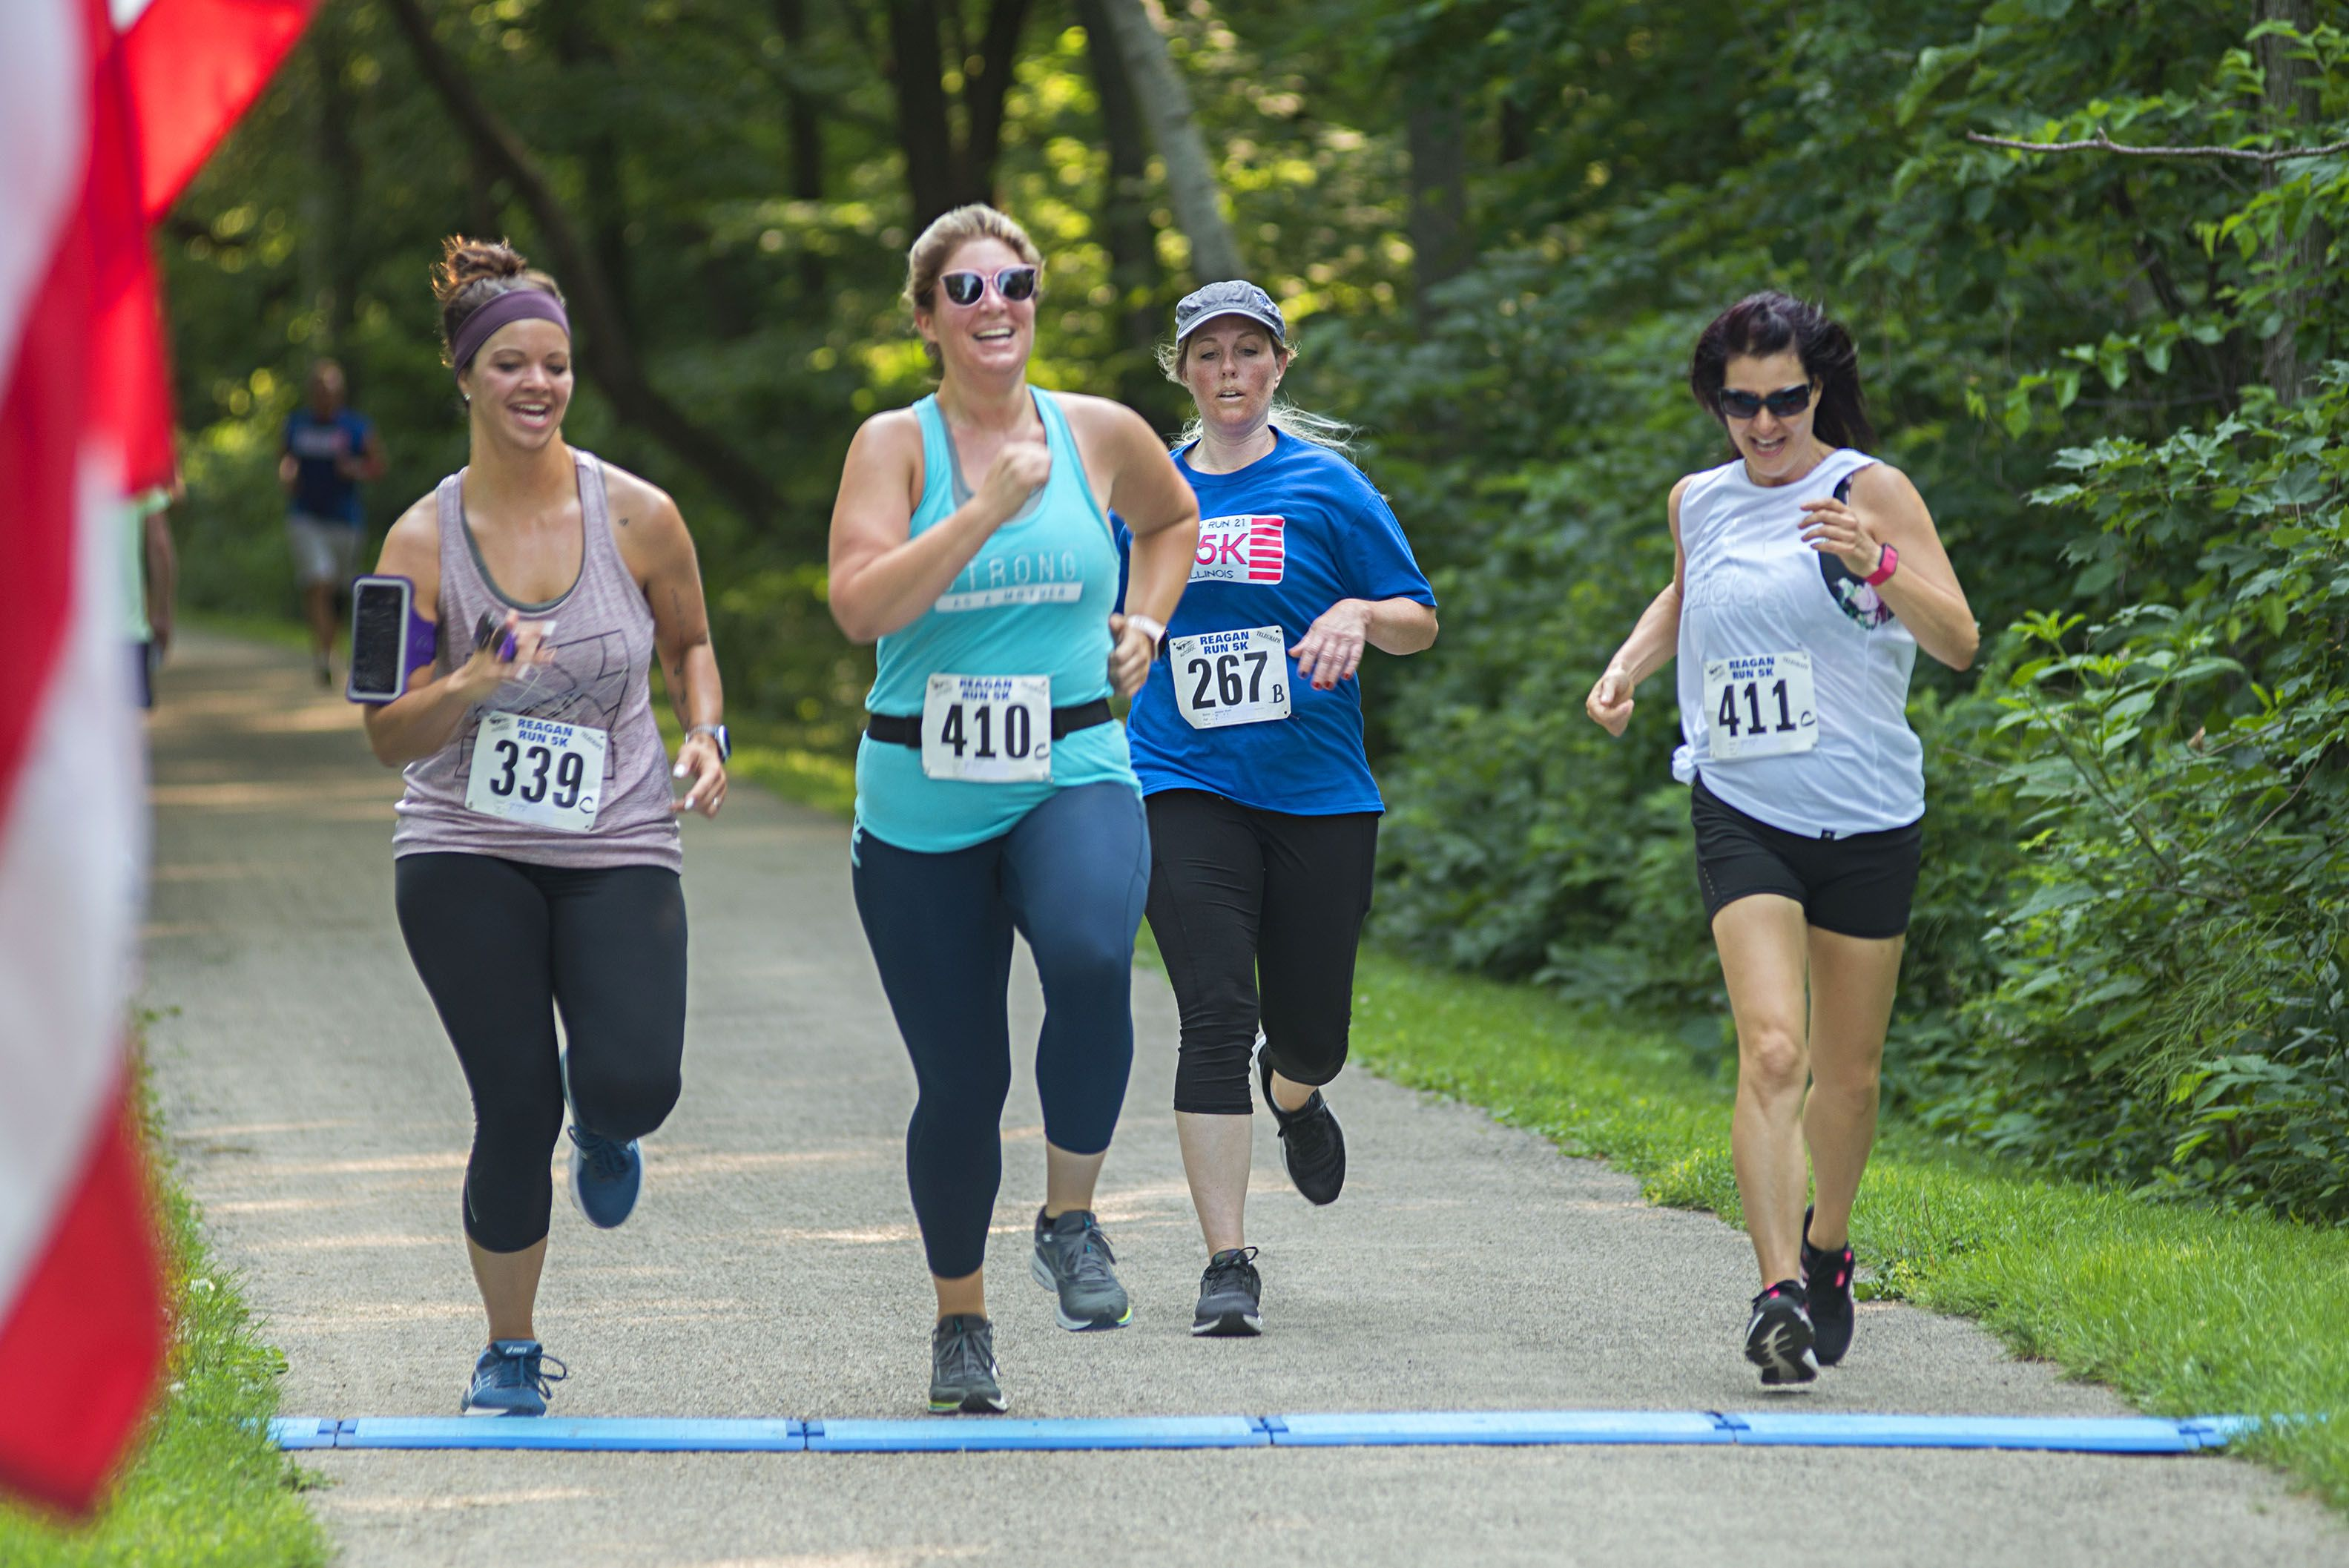 Kylie Stephens (left), Nikki Thomure, Melanie Wyatt and Brenda Van Horn cross the finish line Saturday.